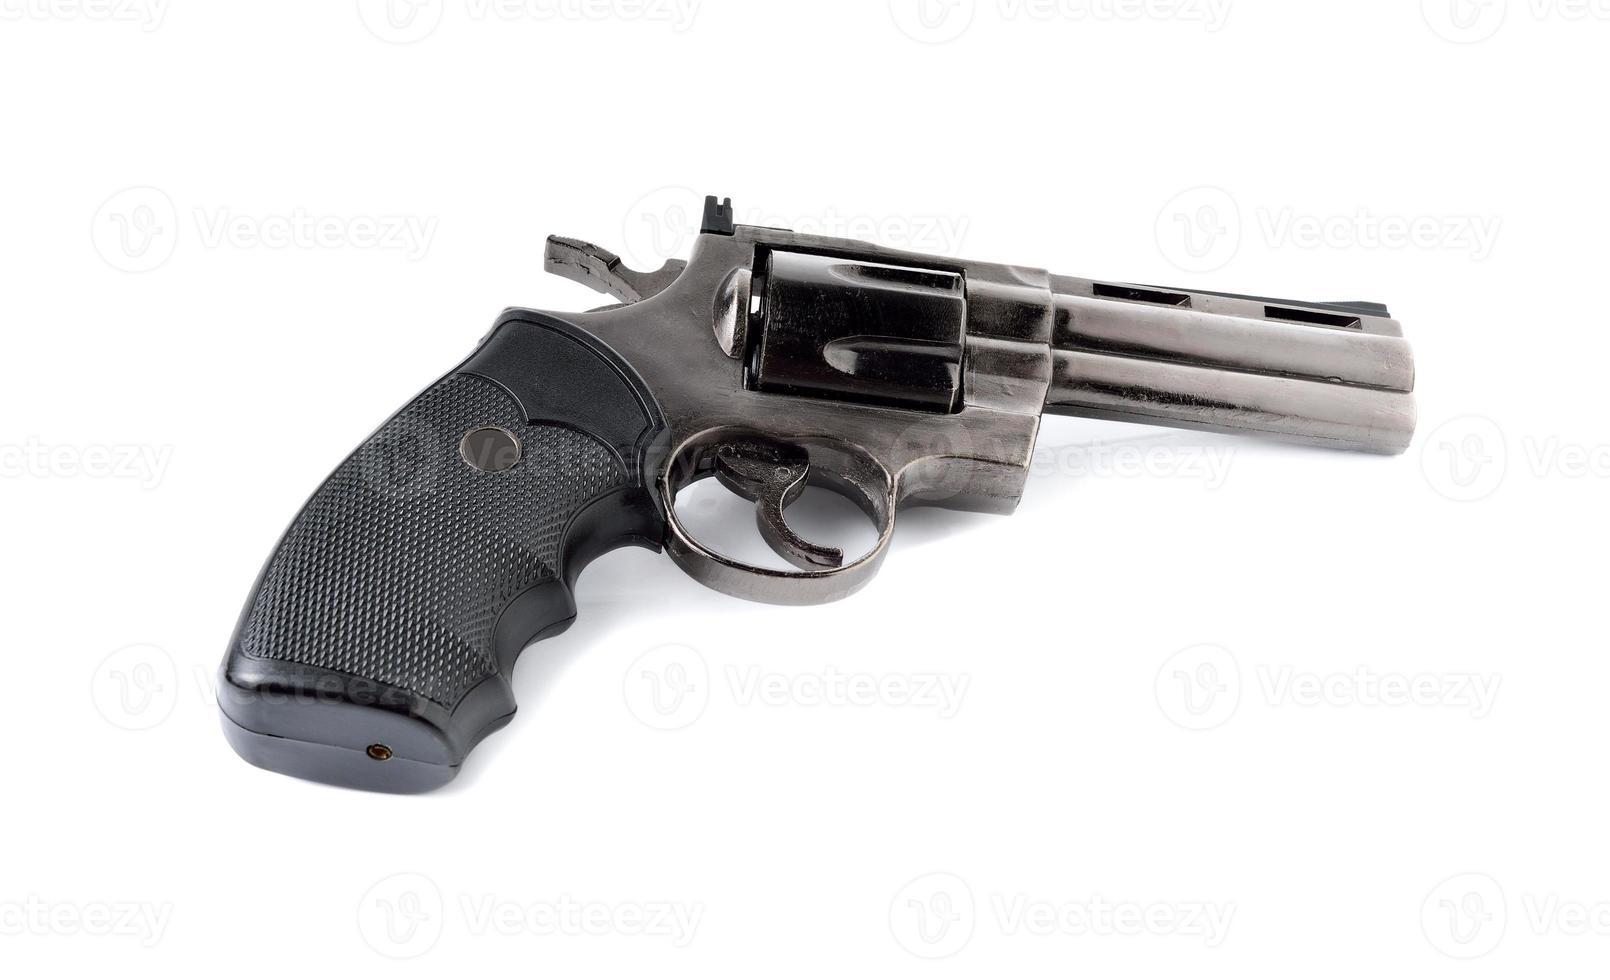 speelgoed pistool 357 magnum revolver op witte achtergrond foto